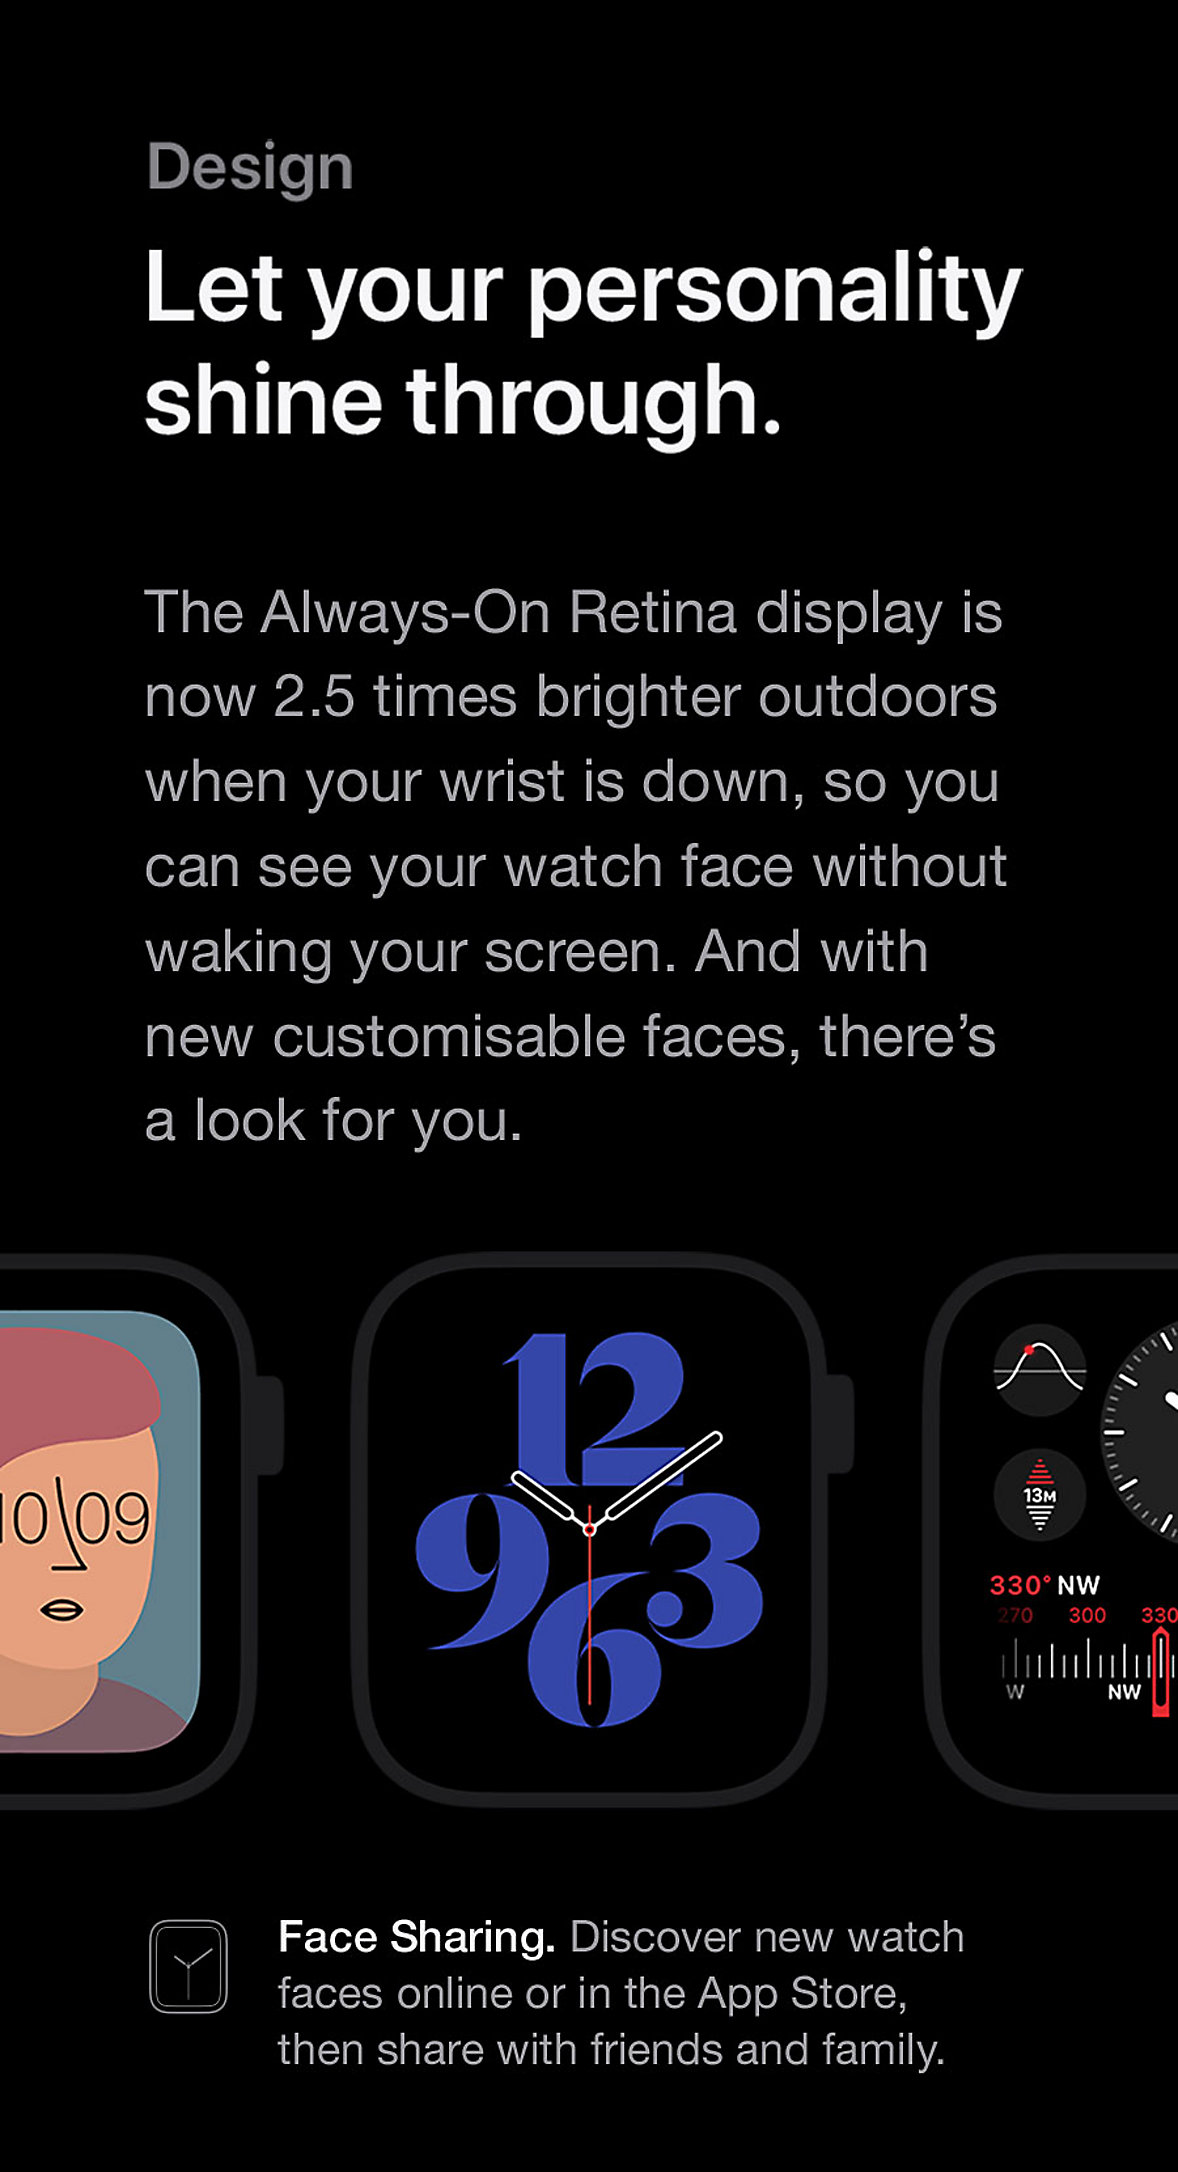 Apple Watch Series 6 Always-On Retina Display Face Sharing